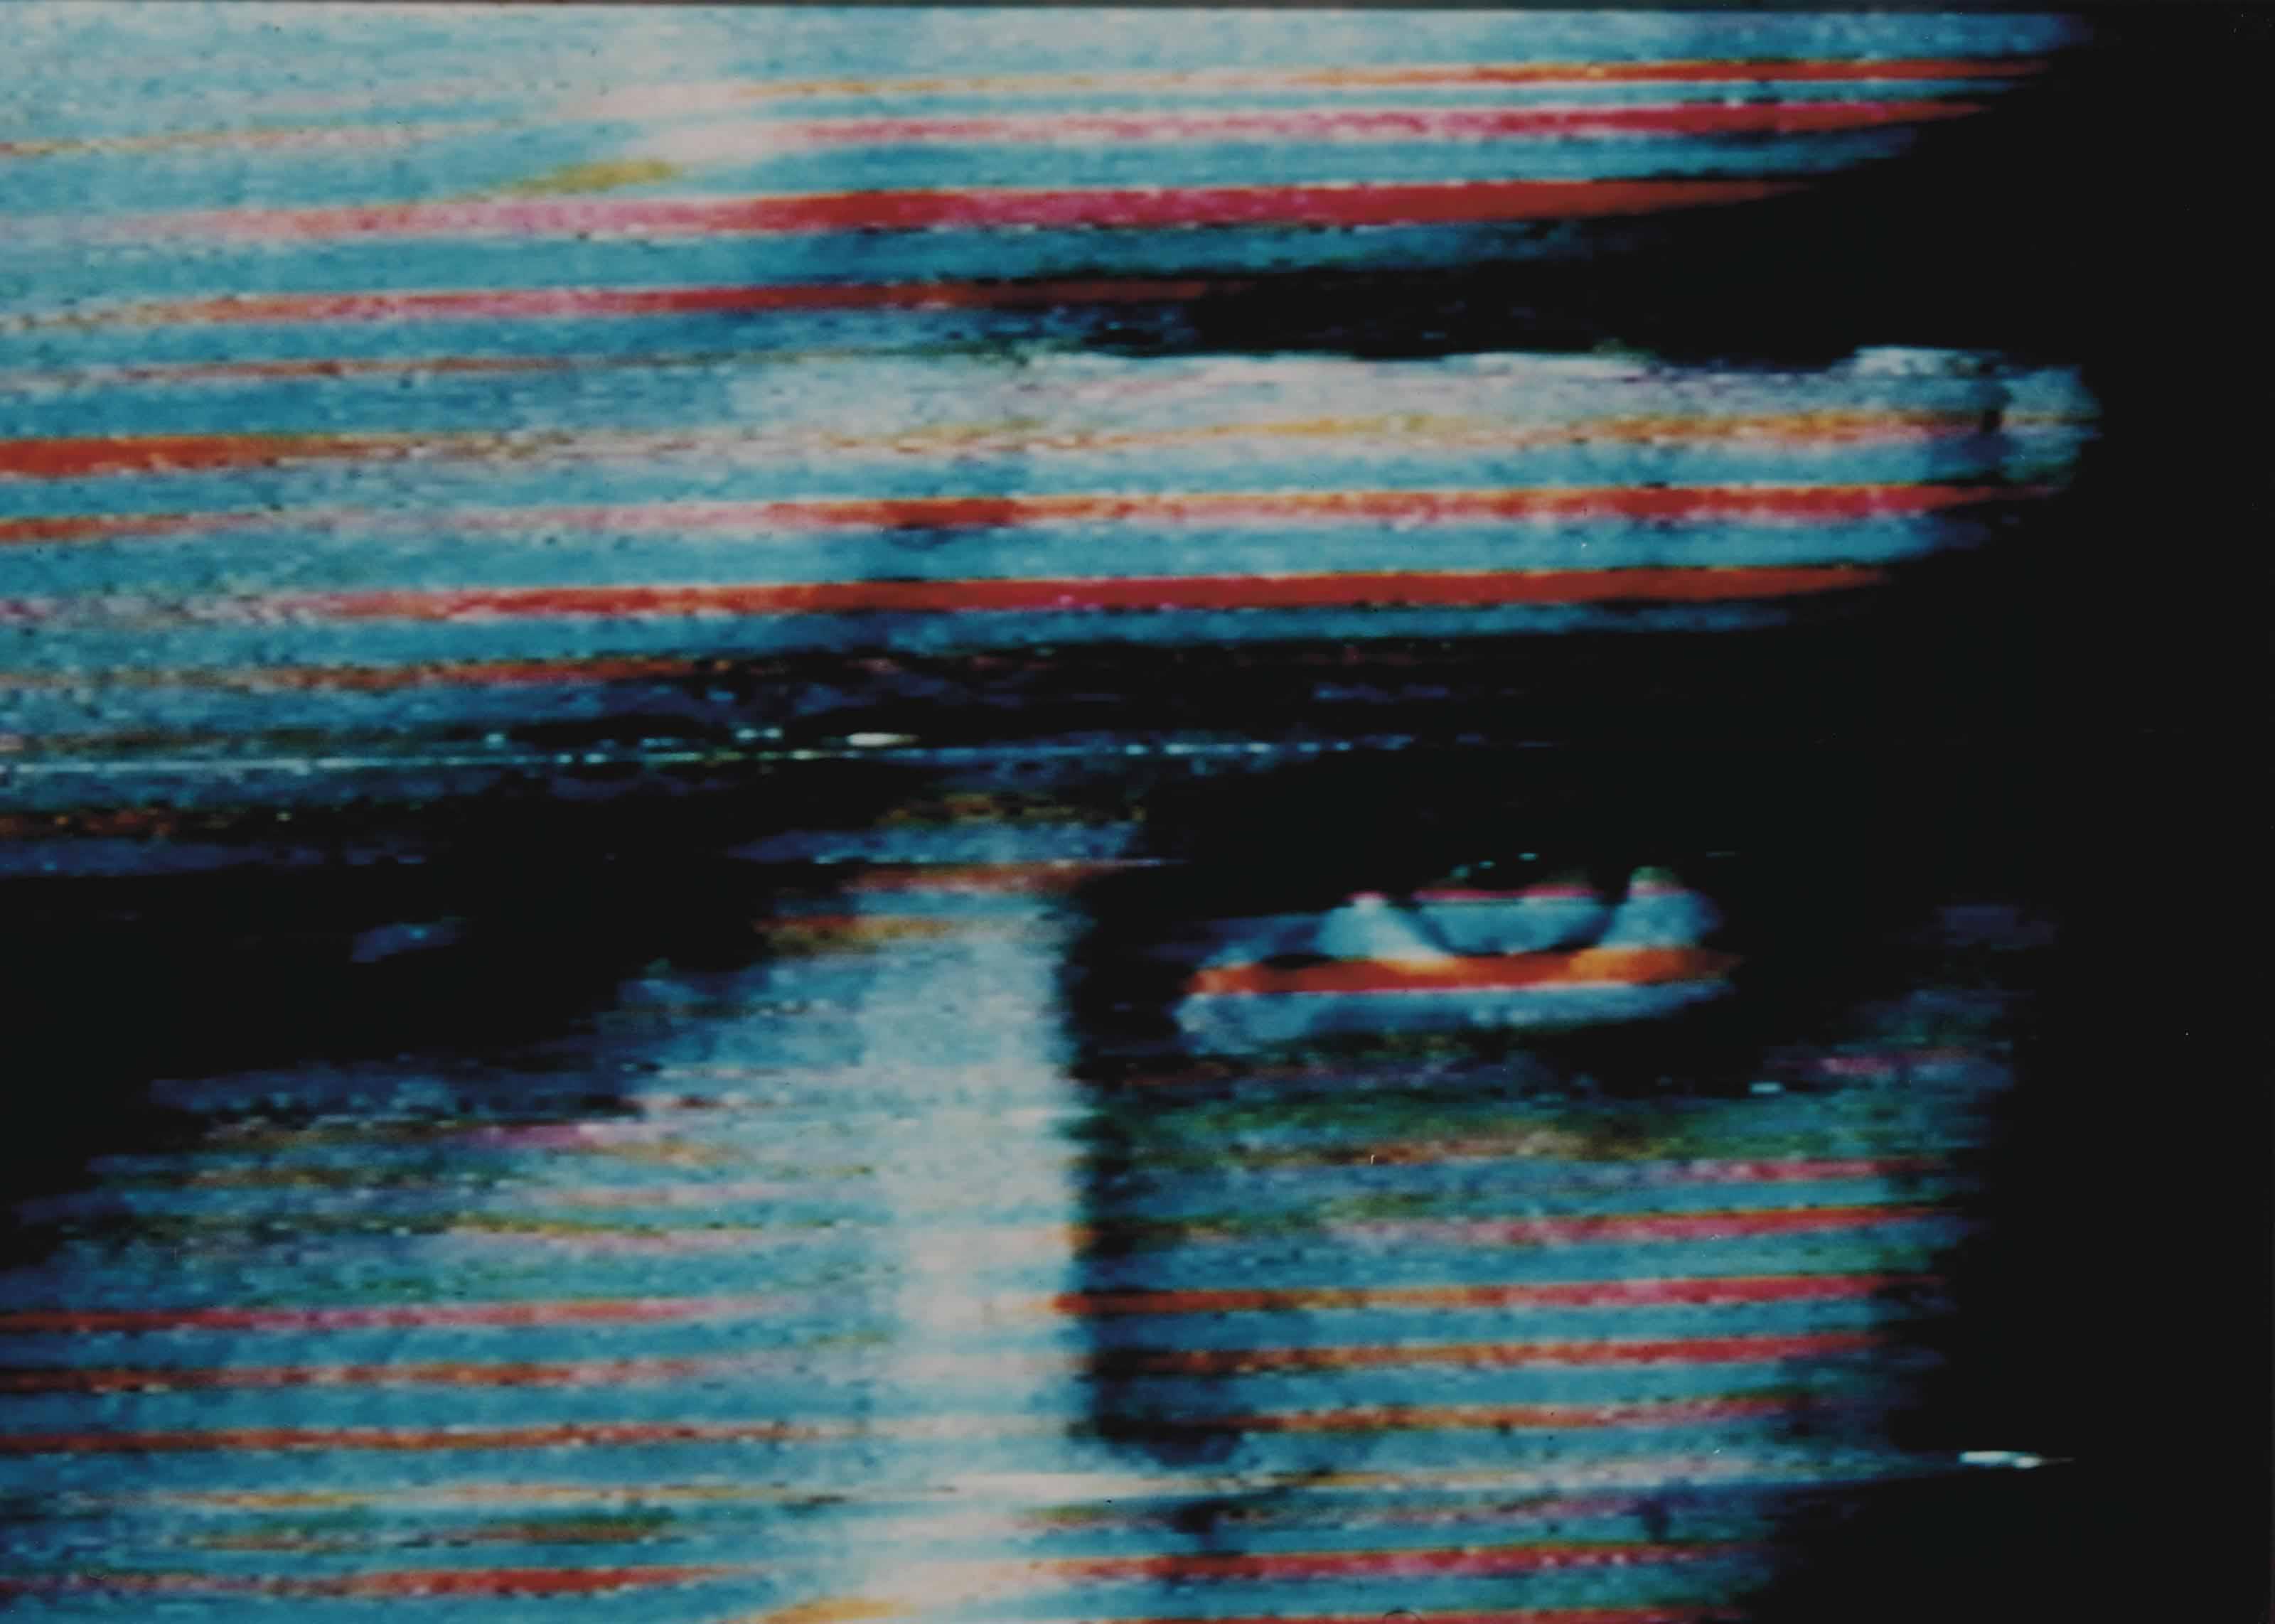 Videostill from: Entlastungen - Pipilotti's Fehler (Absolutions - Pipilotti's Mistakes)